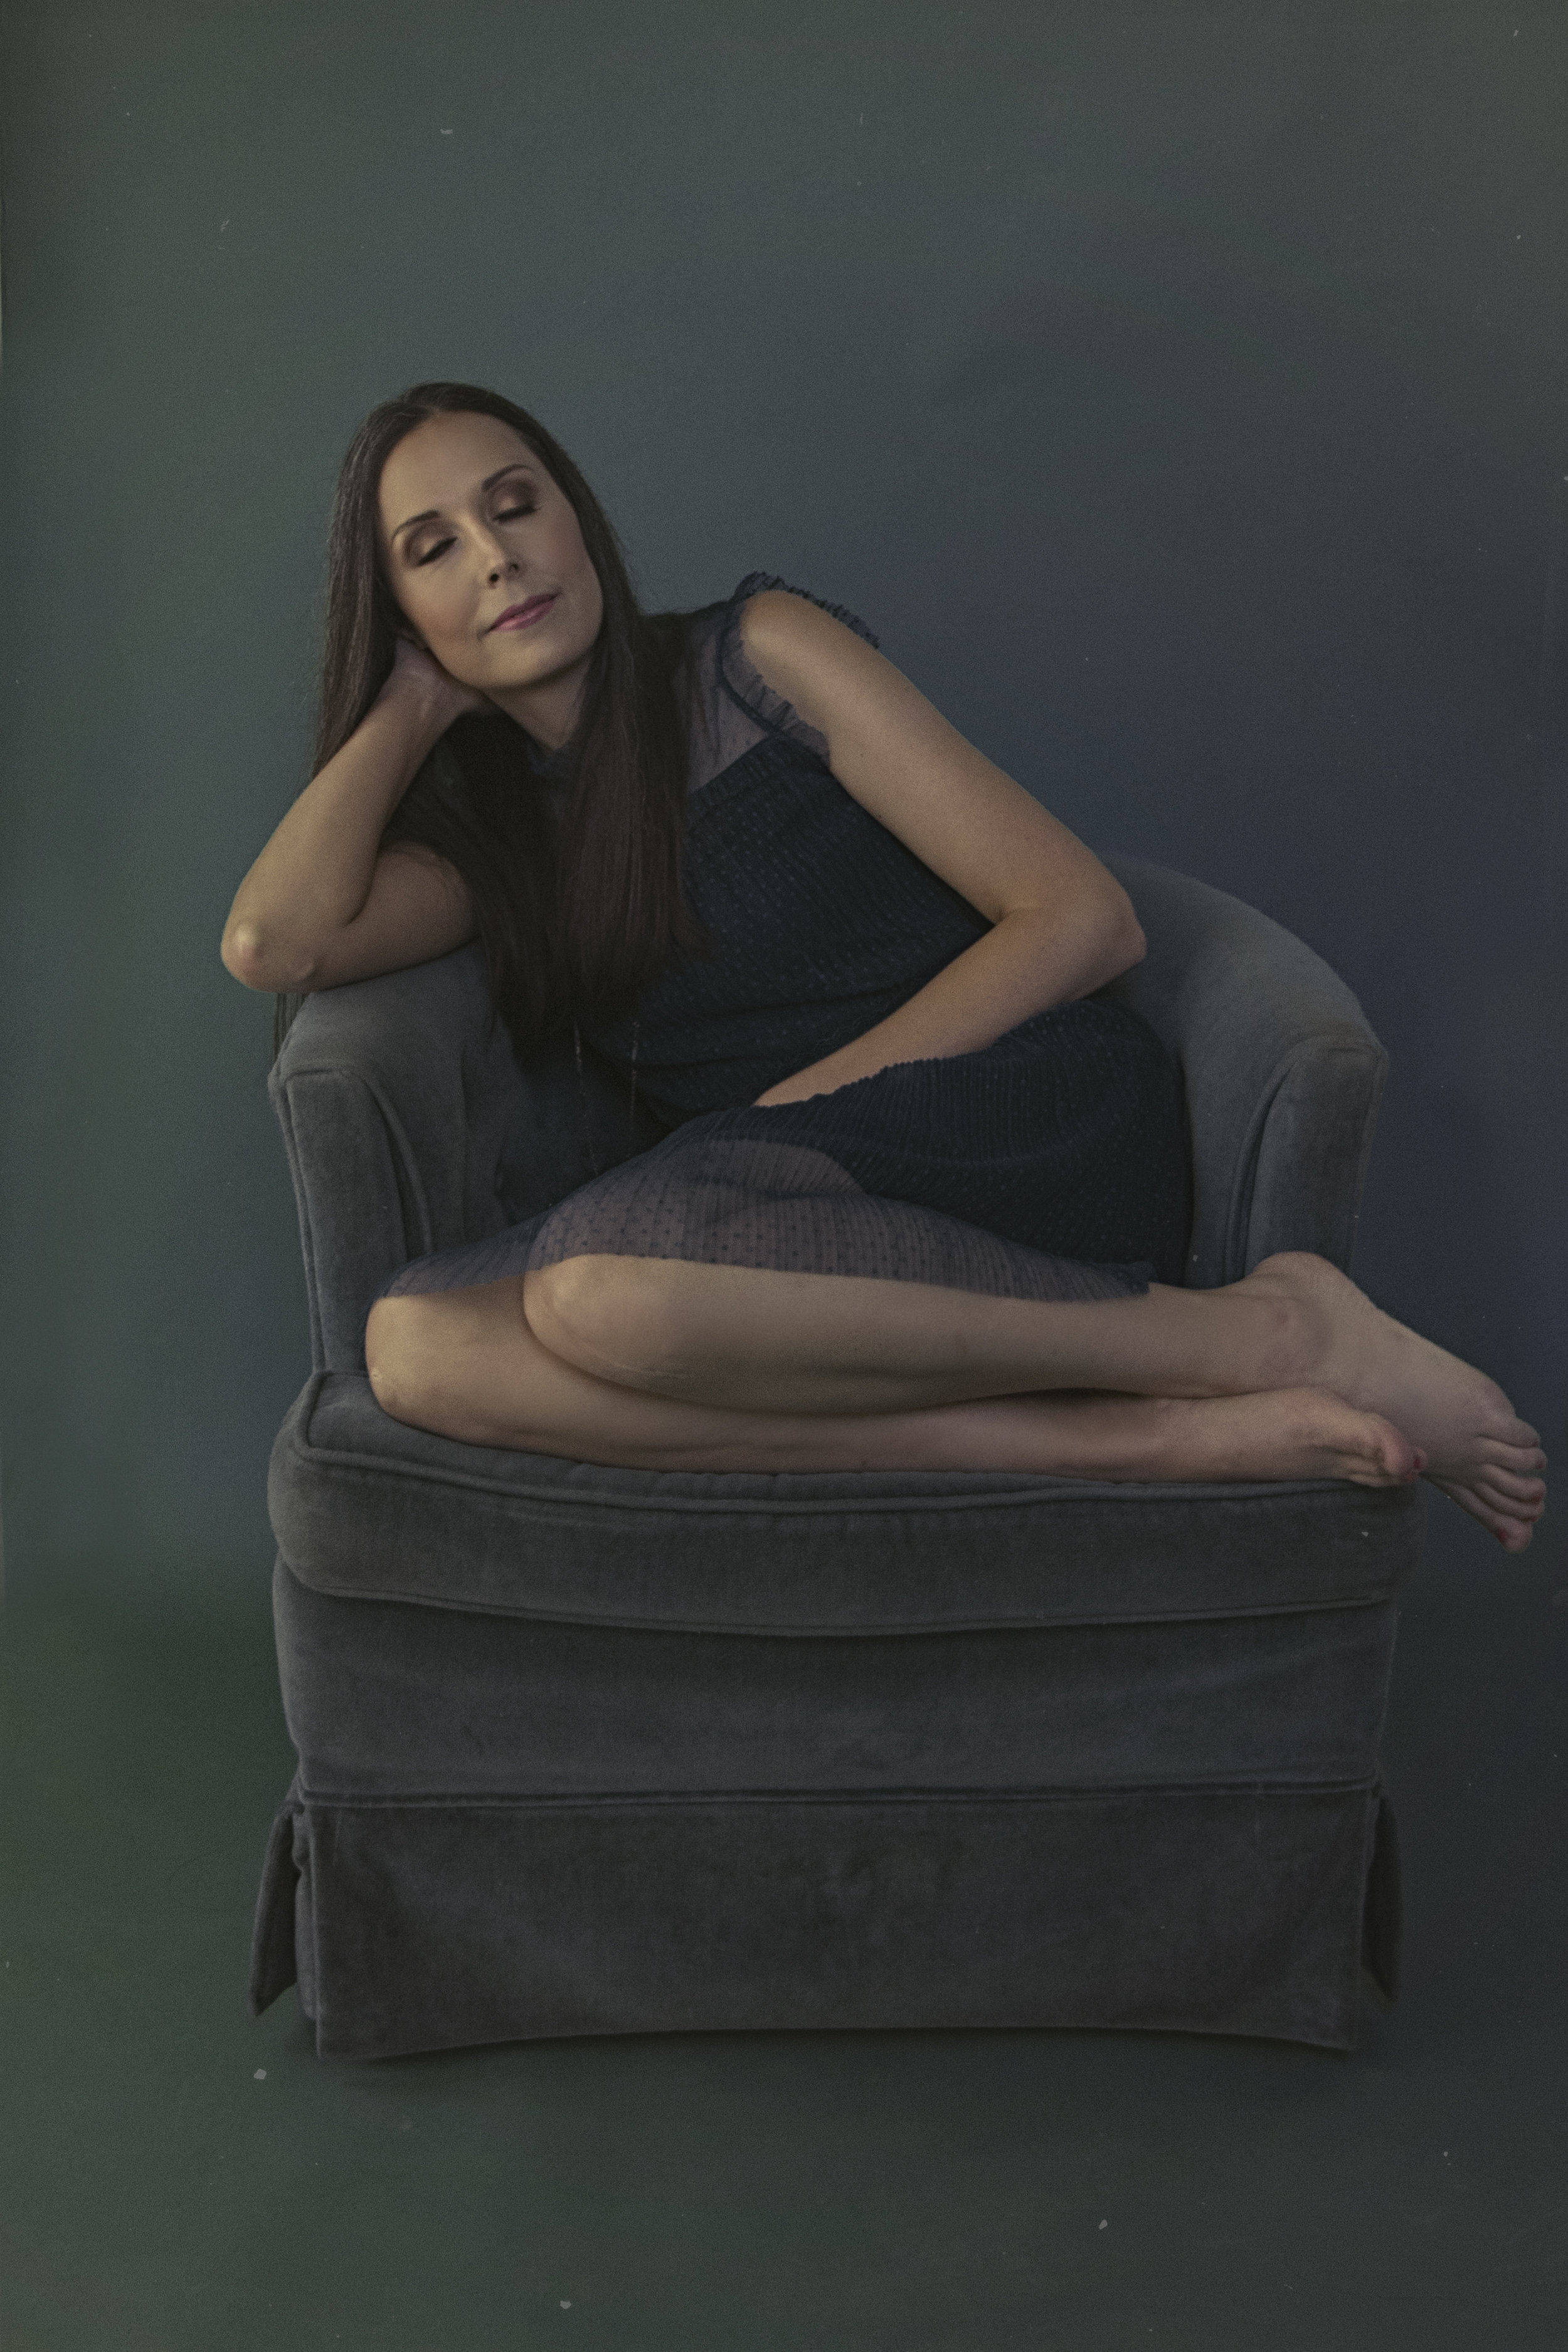 Branding Portrait of a Woman